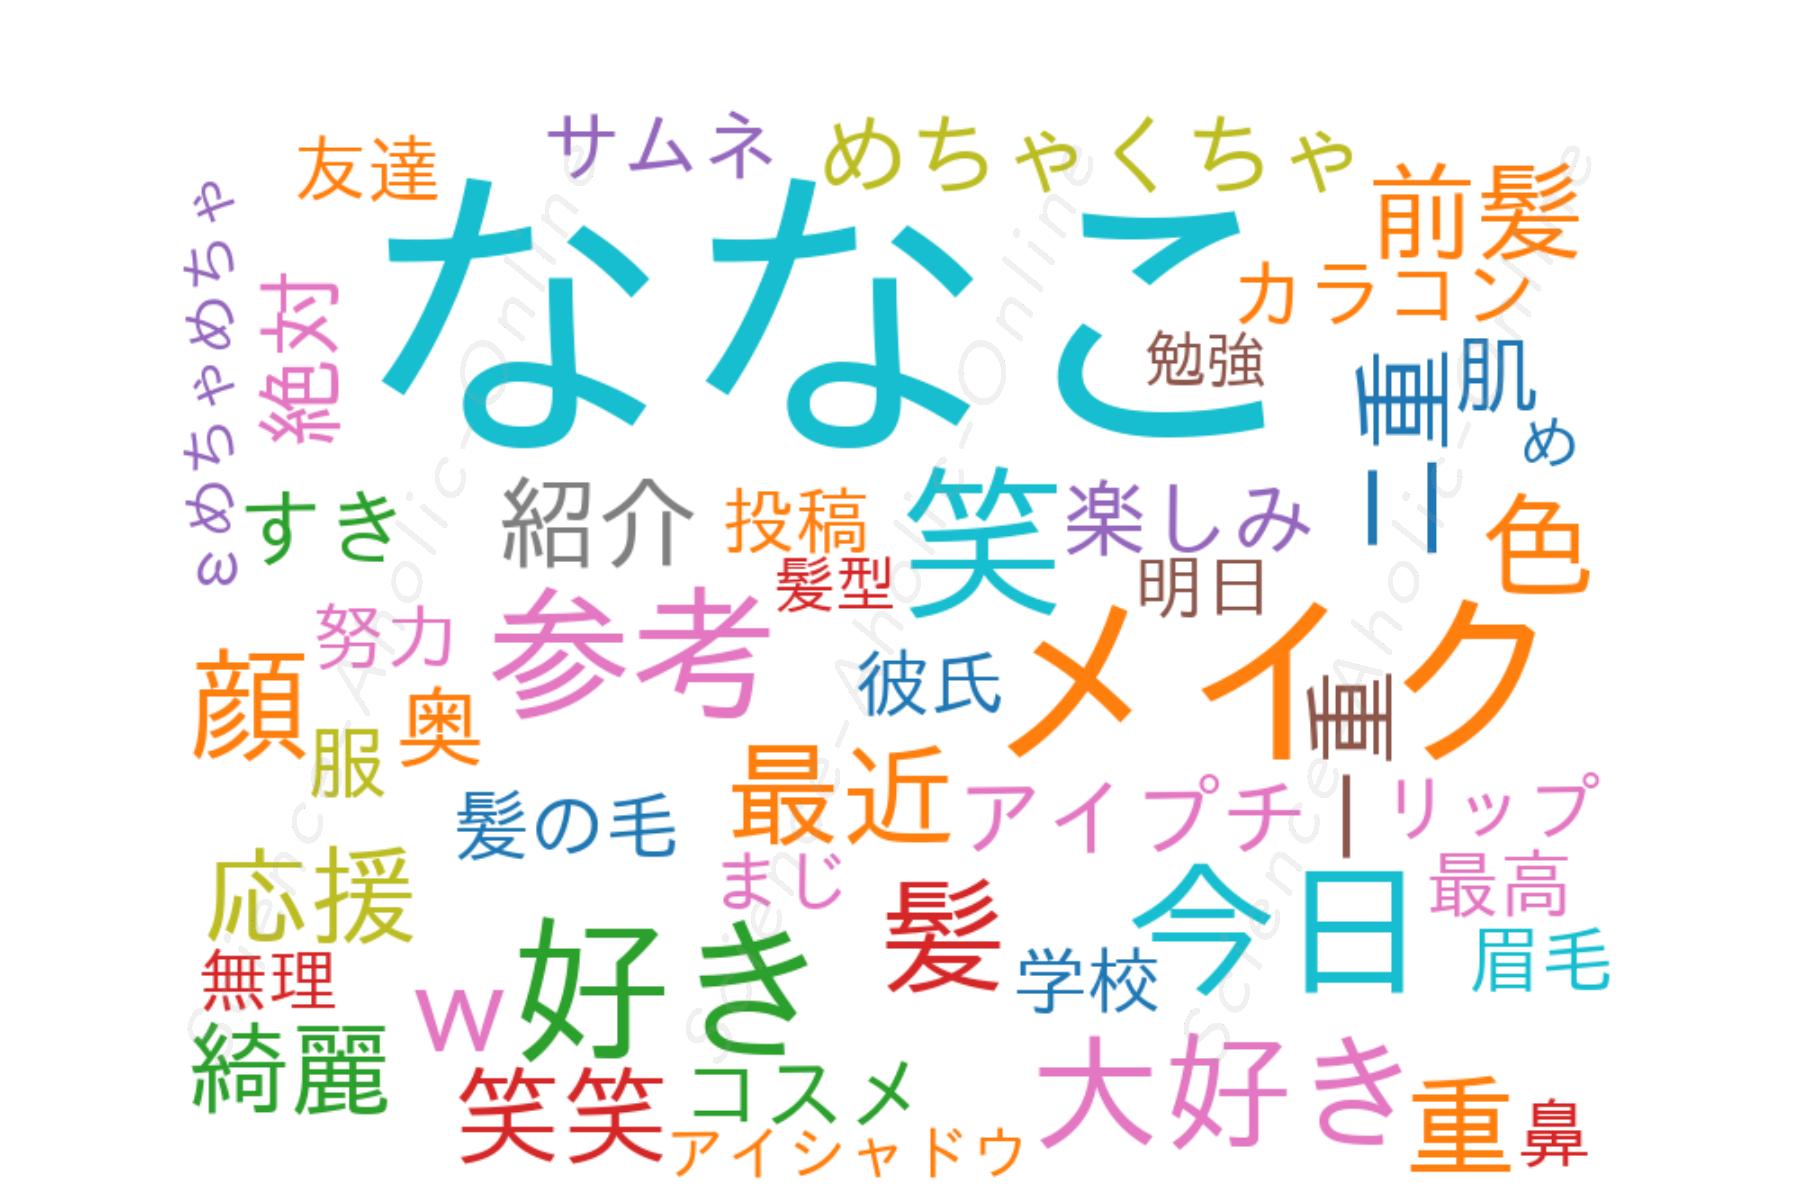 https://science-aholic-online.com/wp-content/uploads/2020/08/wordcloud_nanakoななこ.png